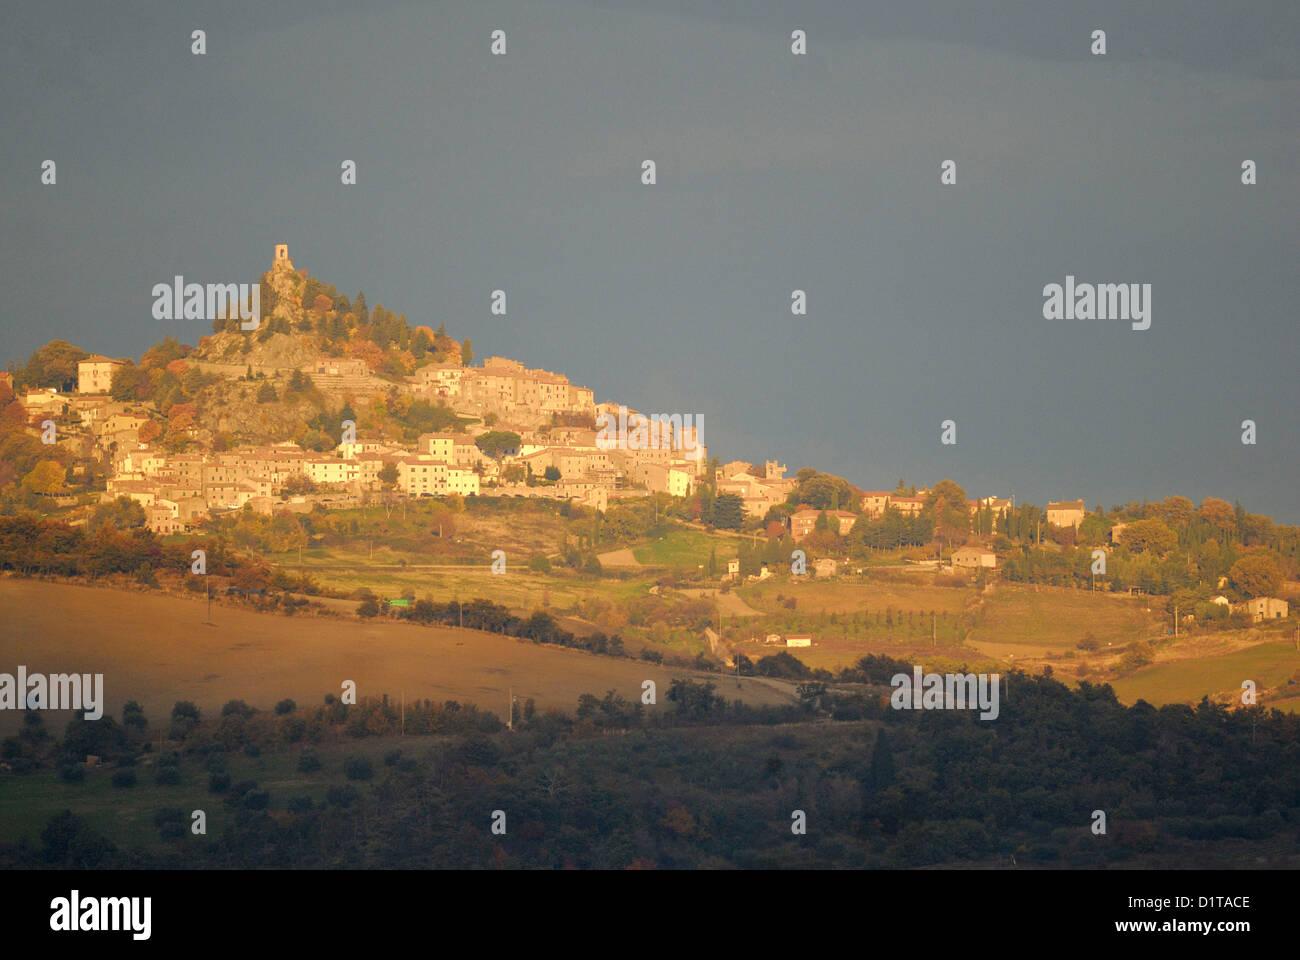 Val d'Orcia paesaggi, Pienza, Siena, Toscana, Italia Immagini Stock